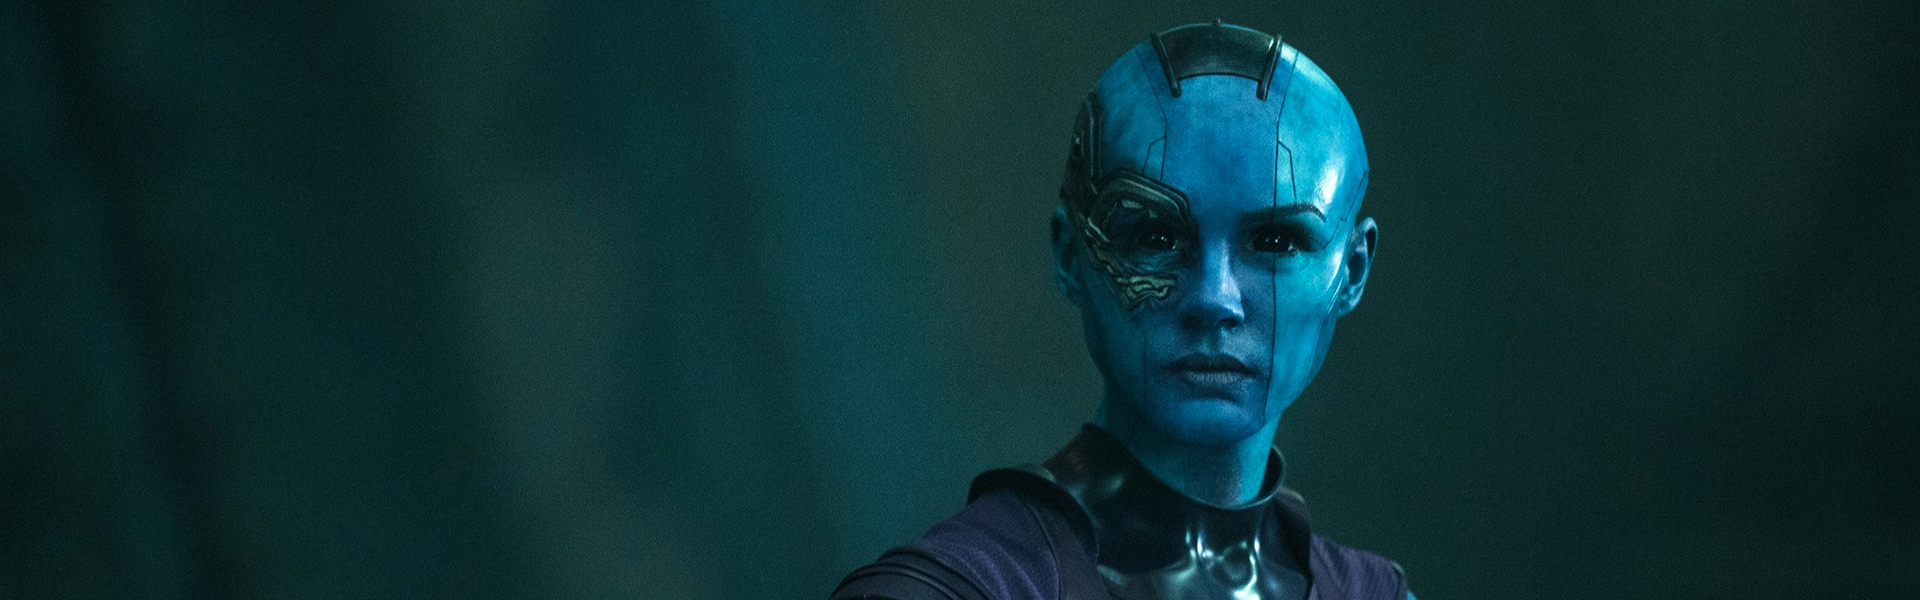 Guardians of the Galaxy vol. 2 Karen Gillan aka Nebula